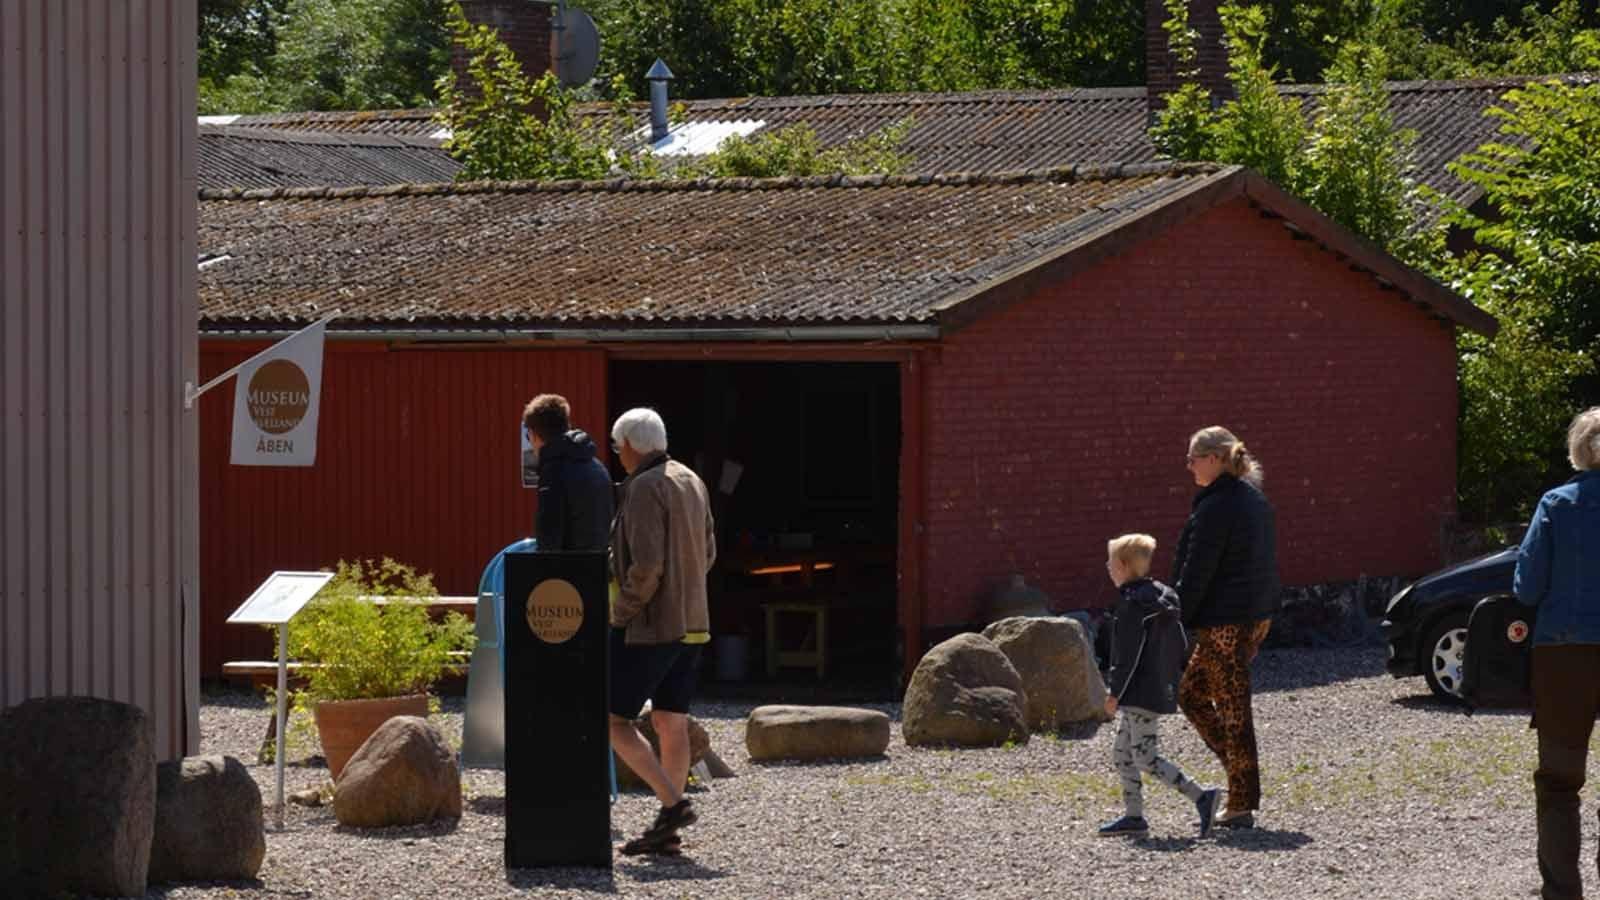 Oldtidslaboratorium i sommerferien